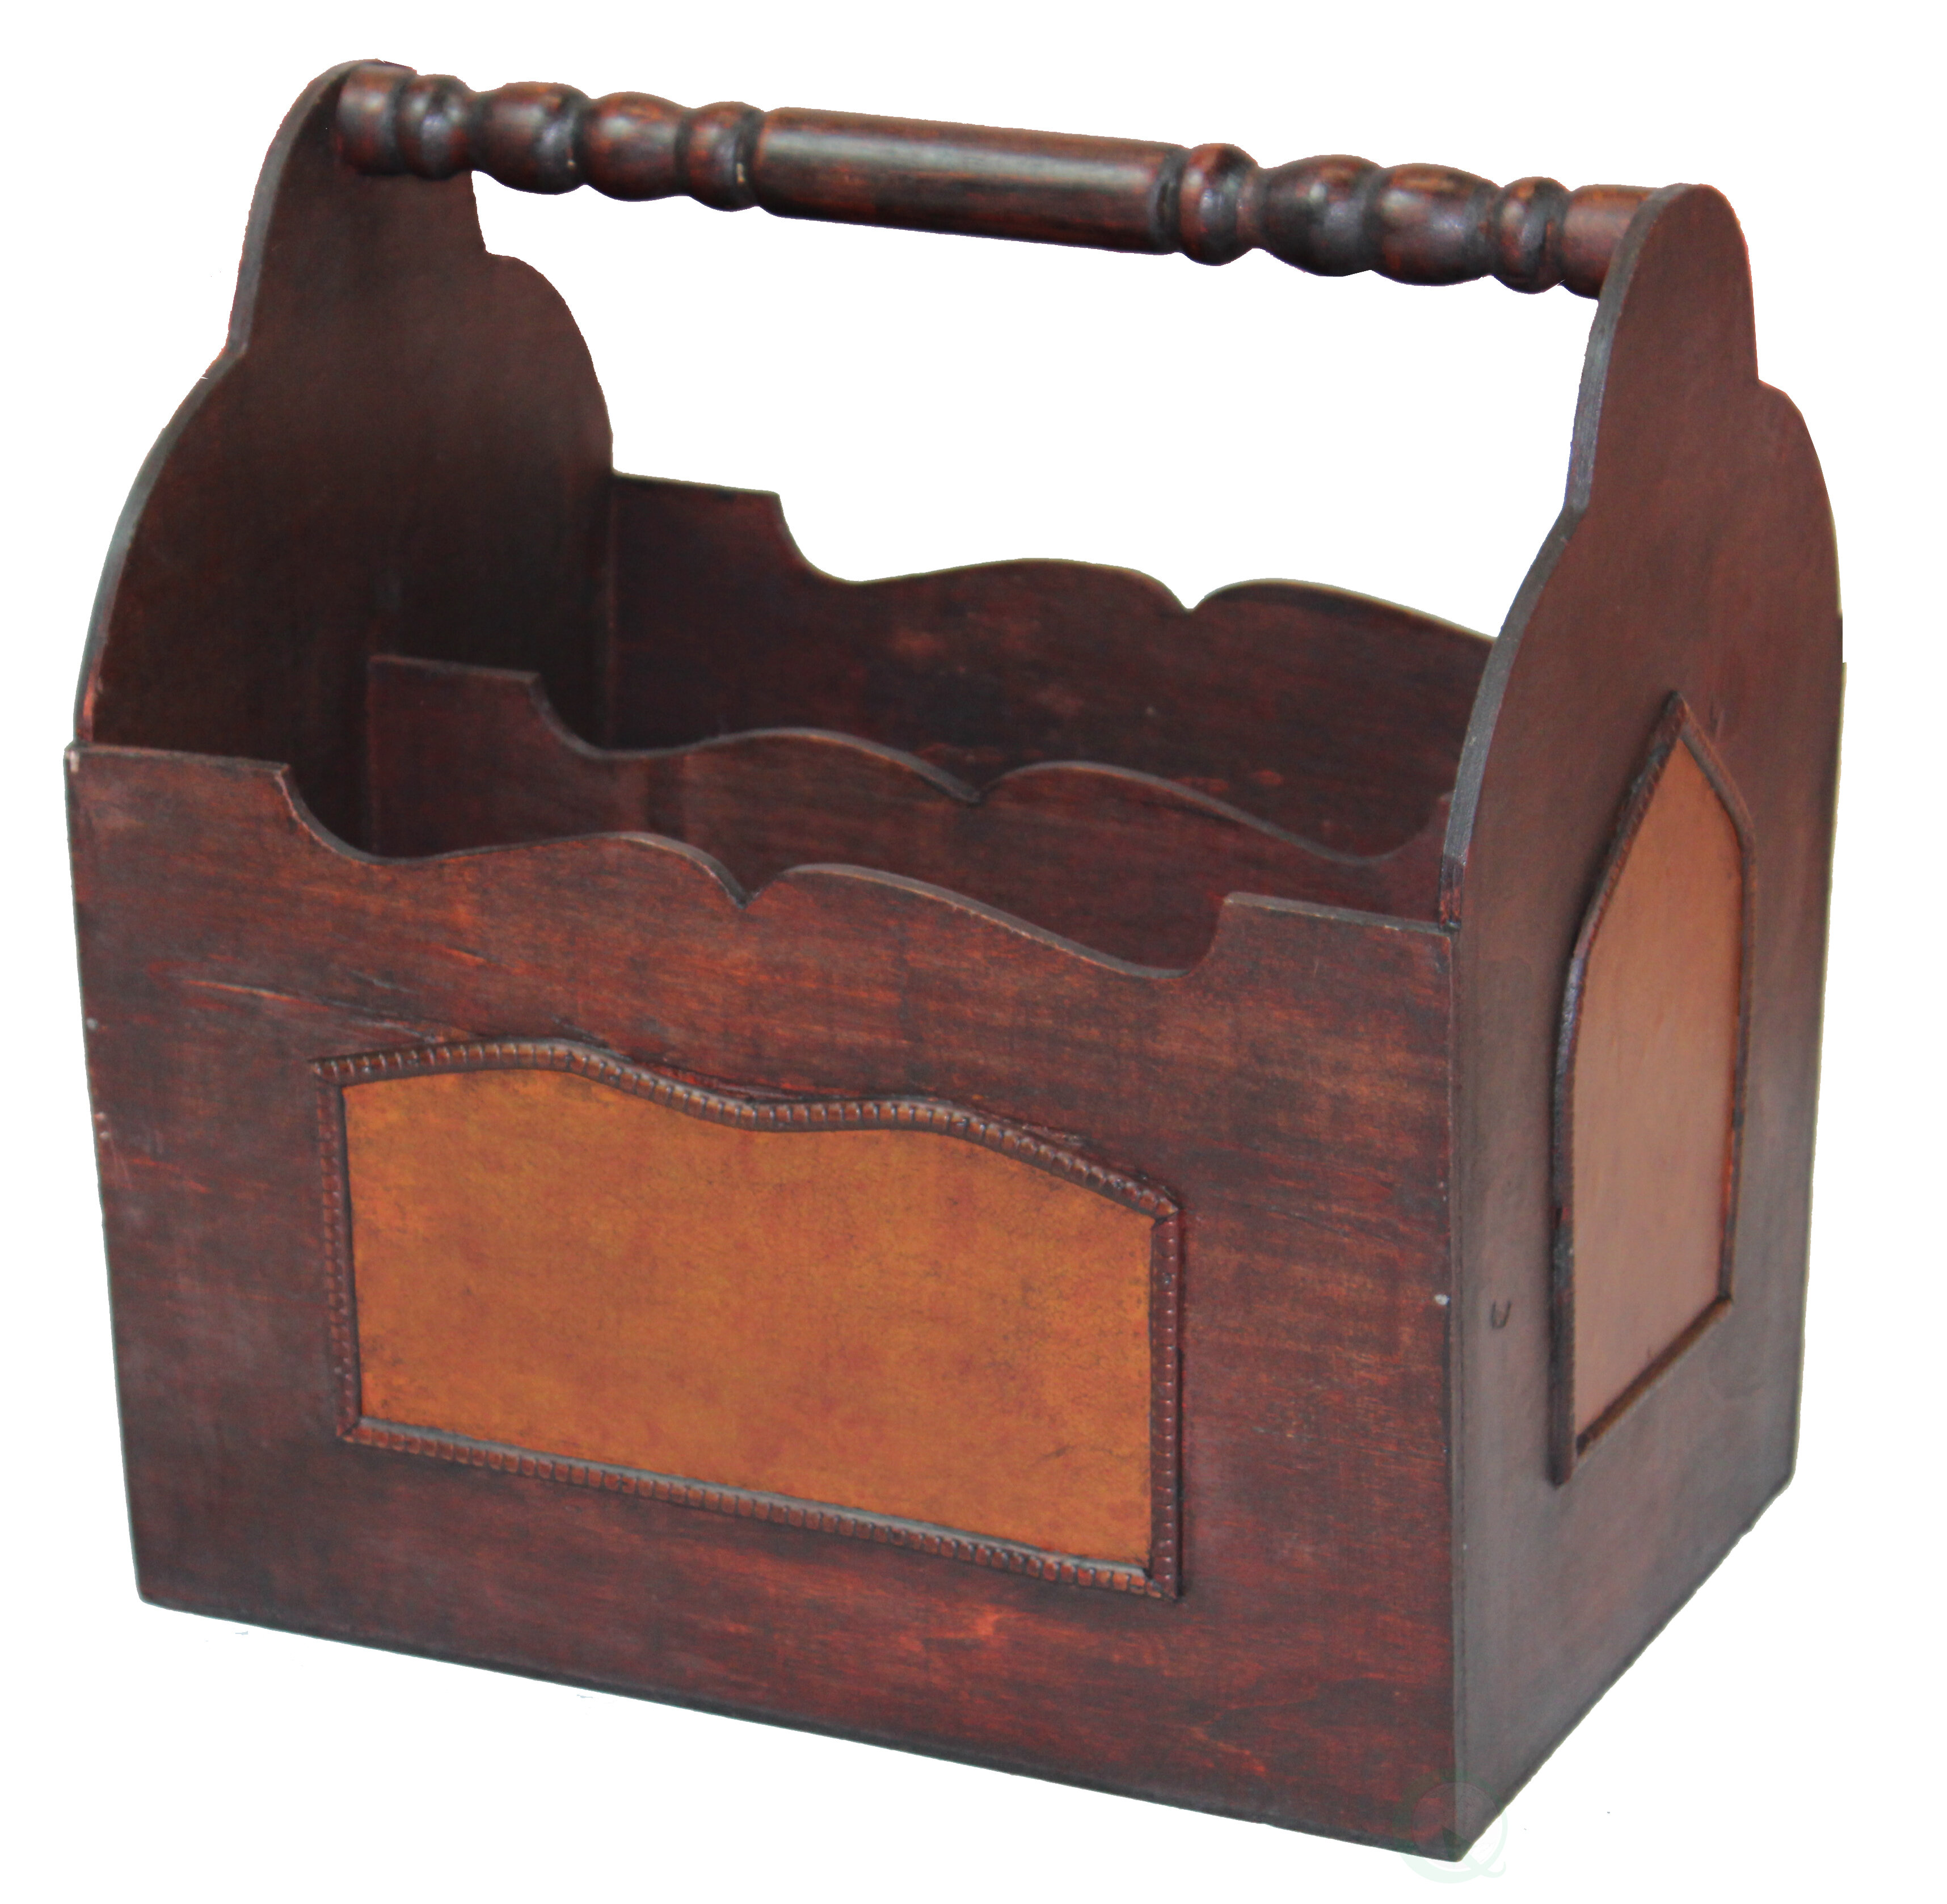 Barnard Handcrafted Decorative Wooden